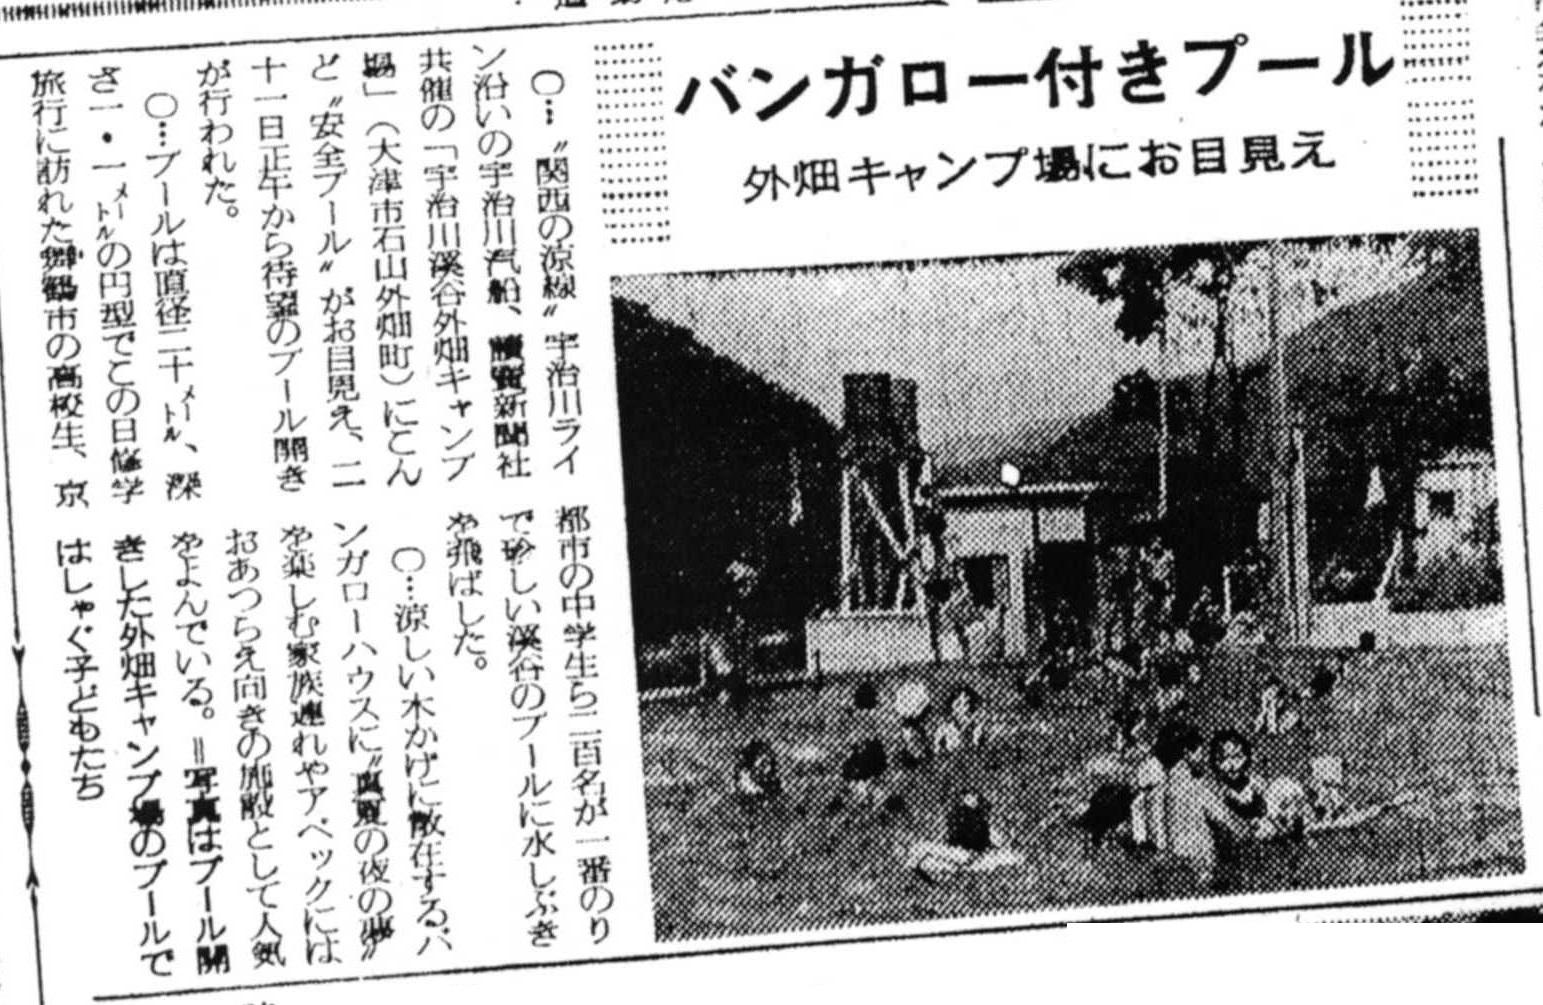 S31.7.22Y 外畑キャンプ場にバンガロー付プールb